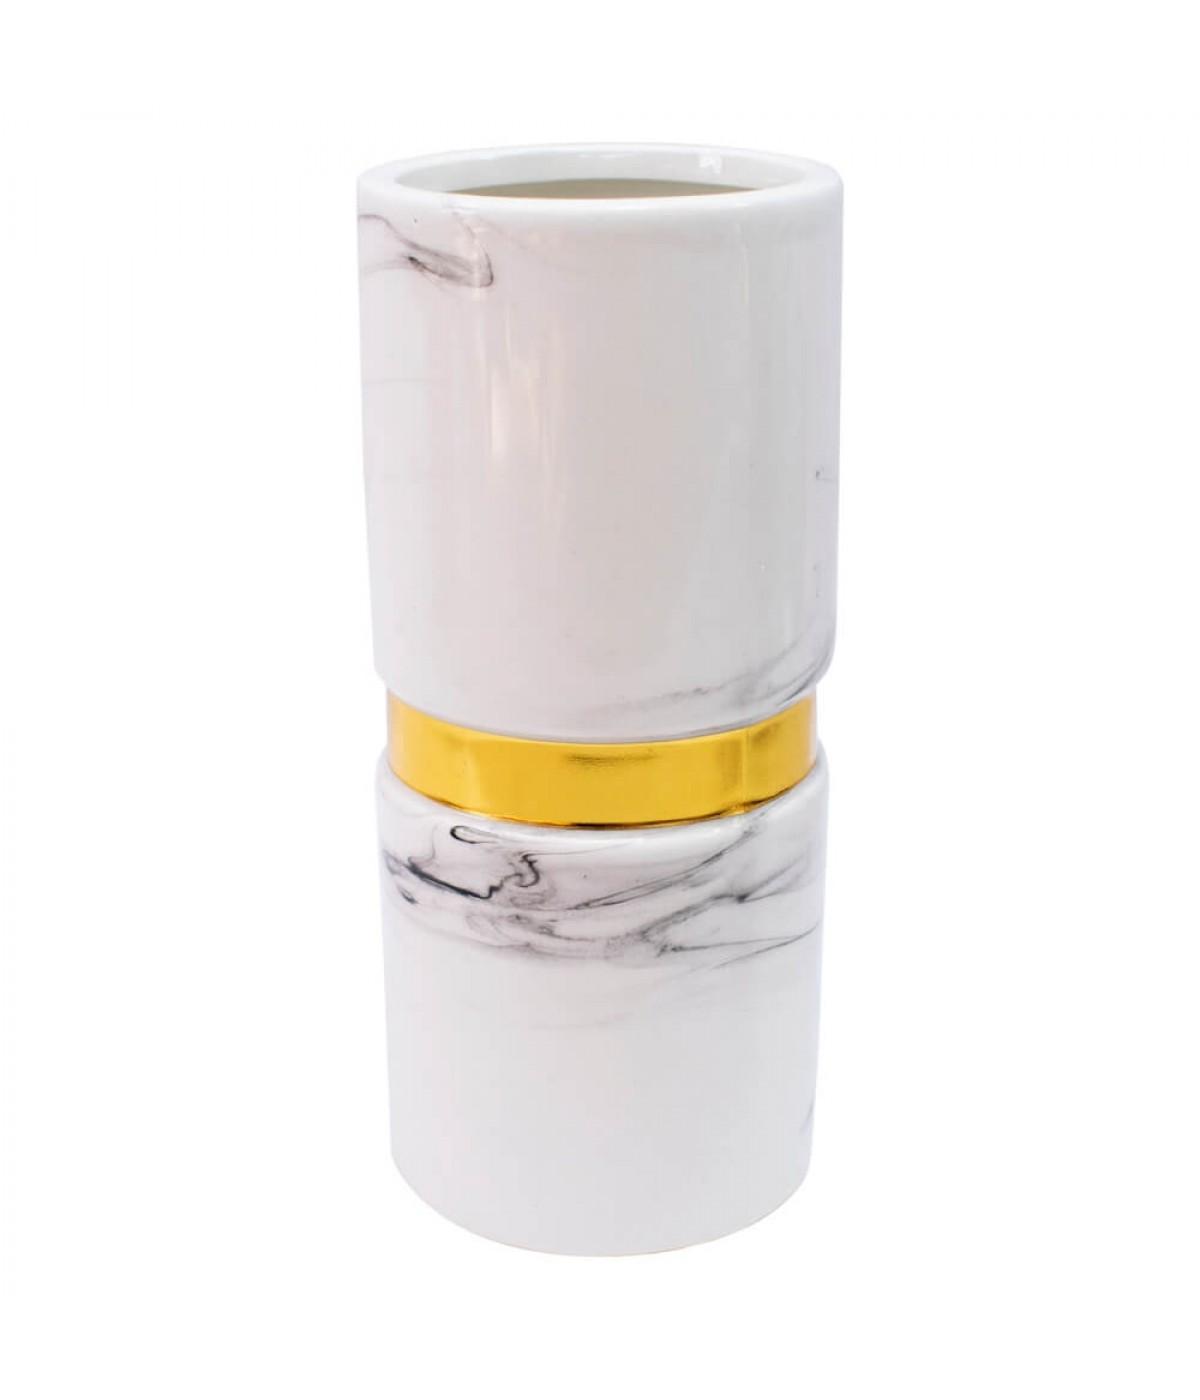 Vaso Porcelana Branca 22x10x10cm